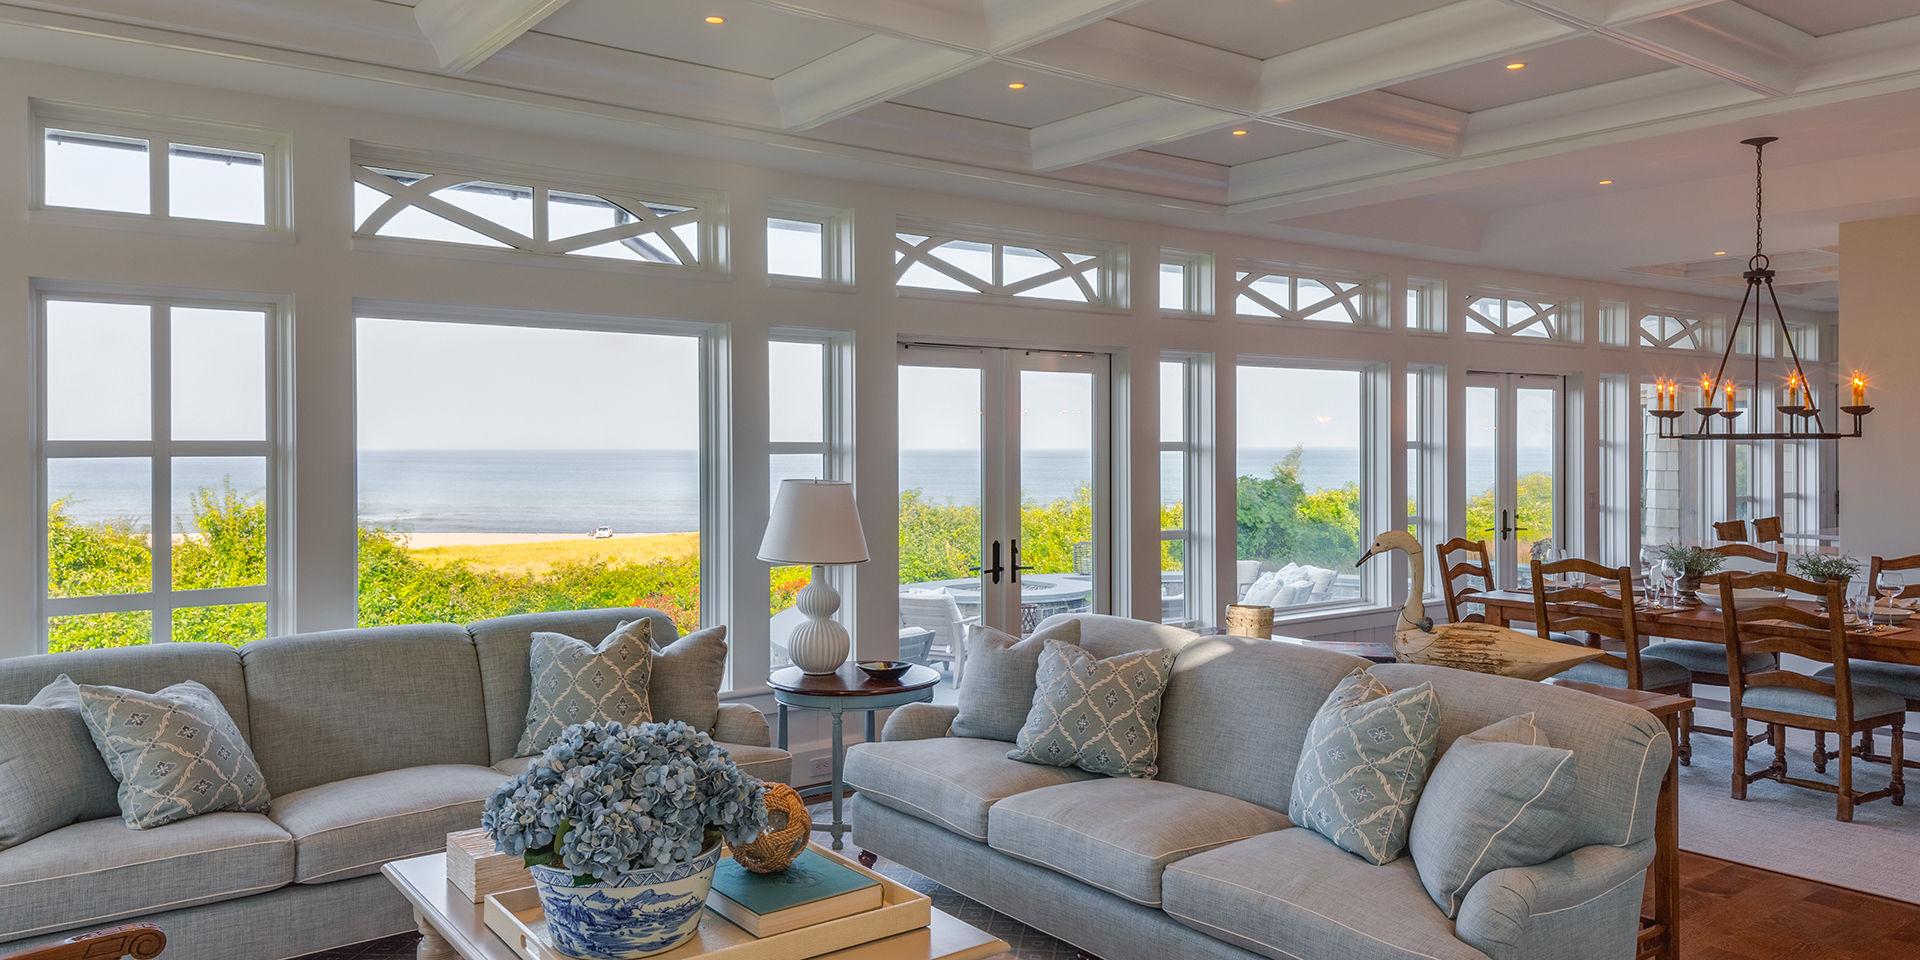 Cape Cod Beach House-A Beautiful Beach House on a Scenic Bluff in Nauset Beach 8.jpg